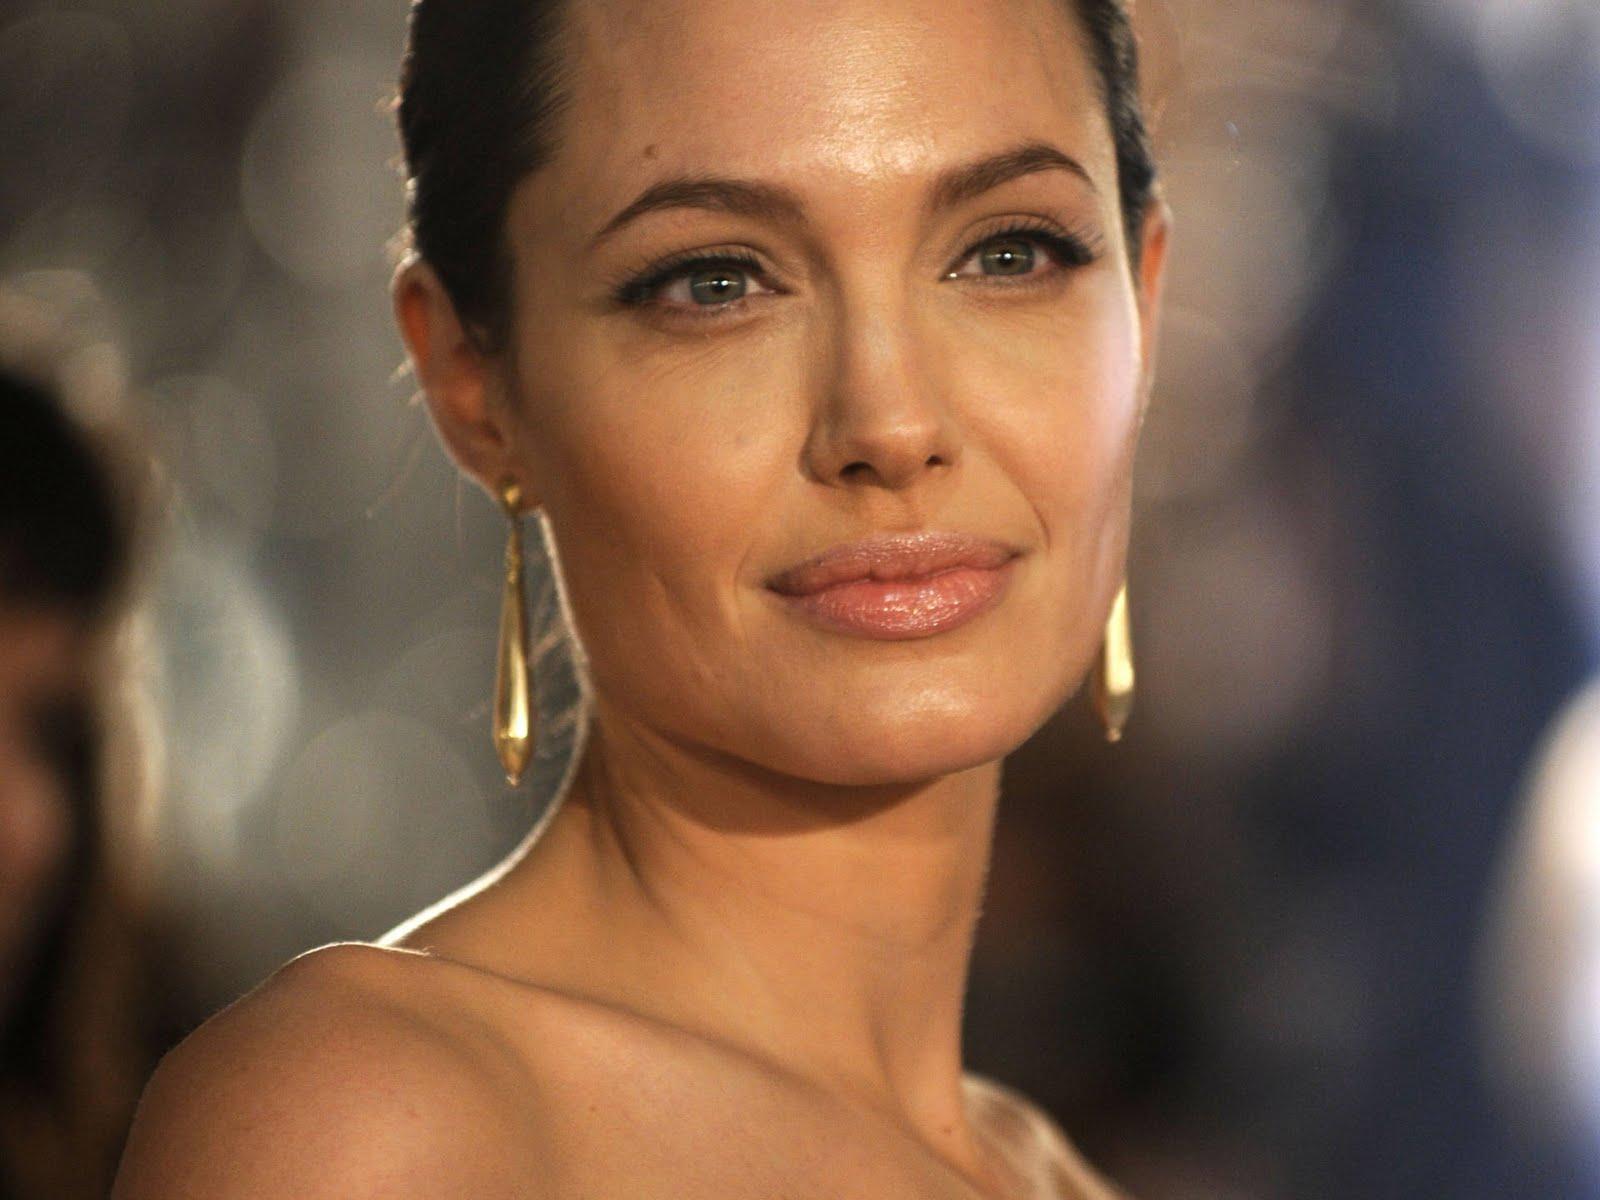 http://4.bp.blogspot.com/_p2EstT5Z5BU/THtqOtn01cI/AAAAAAAAAsQ/HD0Ee1HbWOo/s1600/Angelina+Jolie+Wallpapers+2.jpg